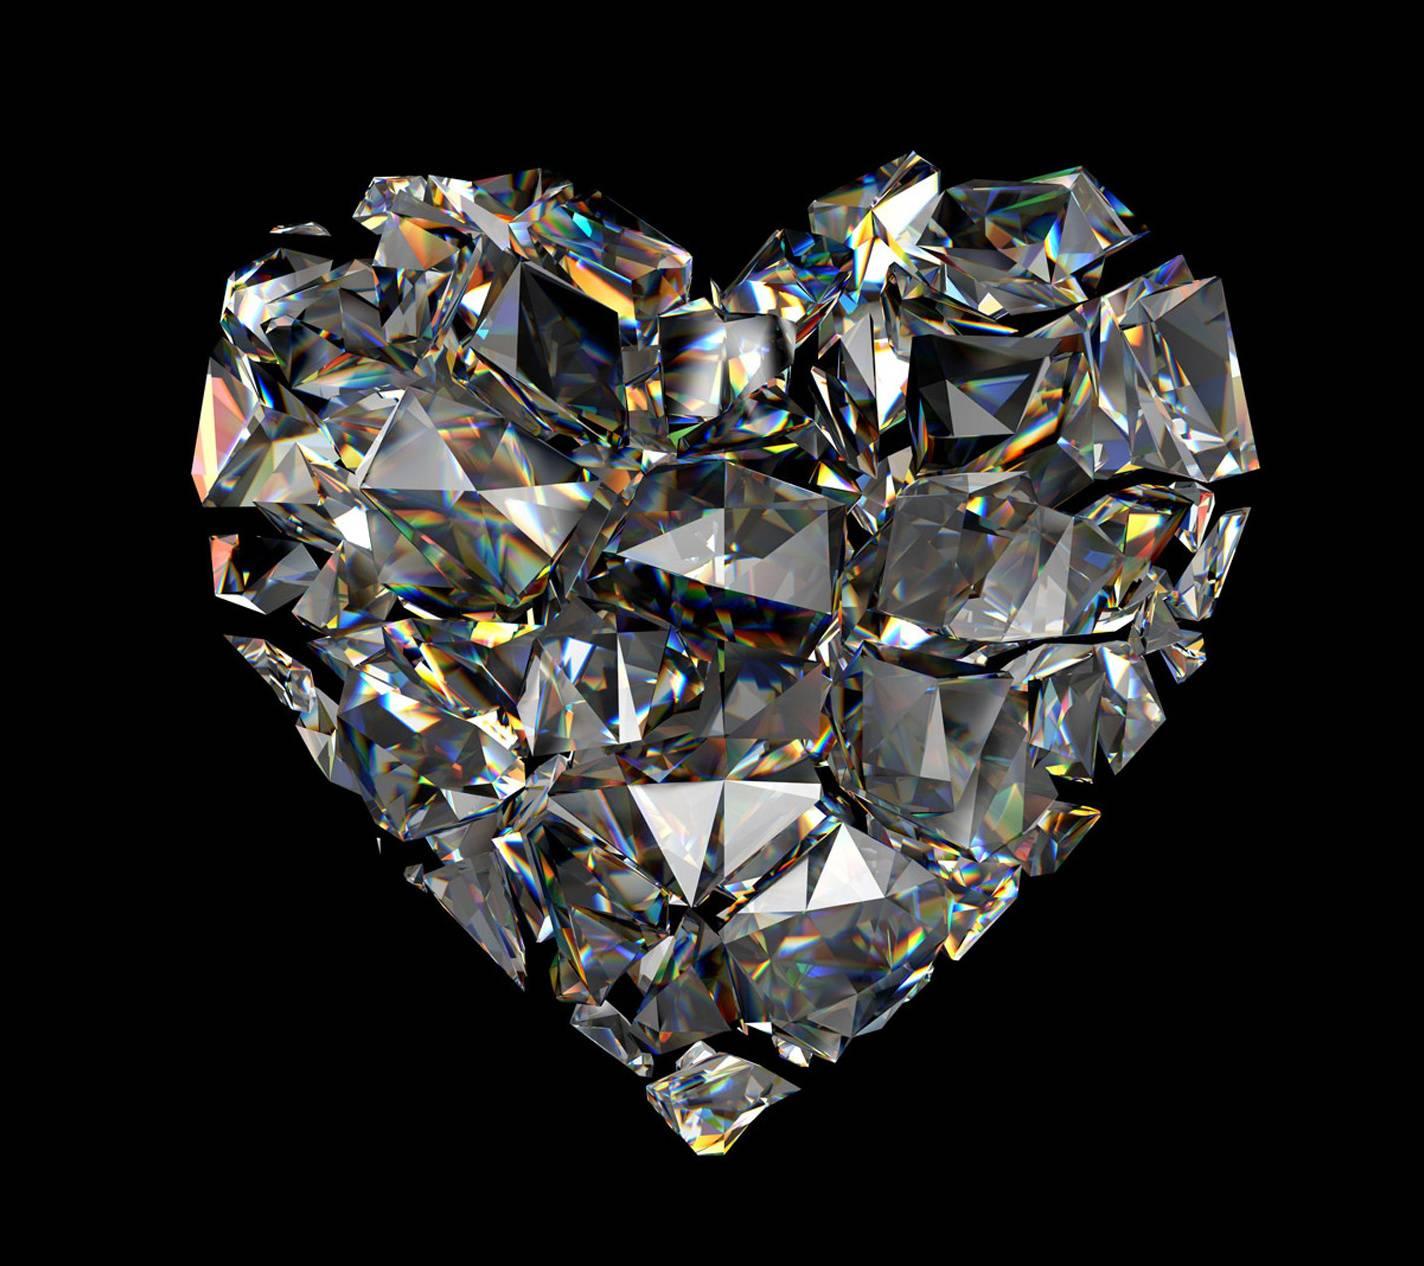 Dimond Heart